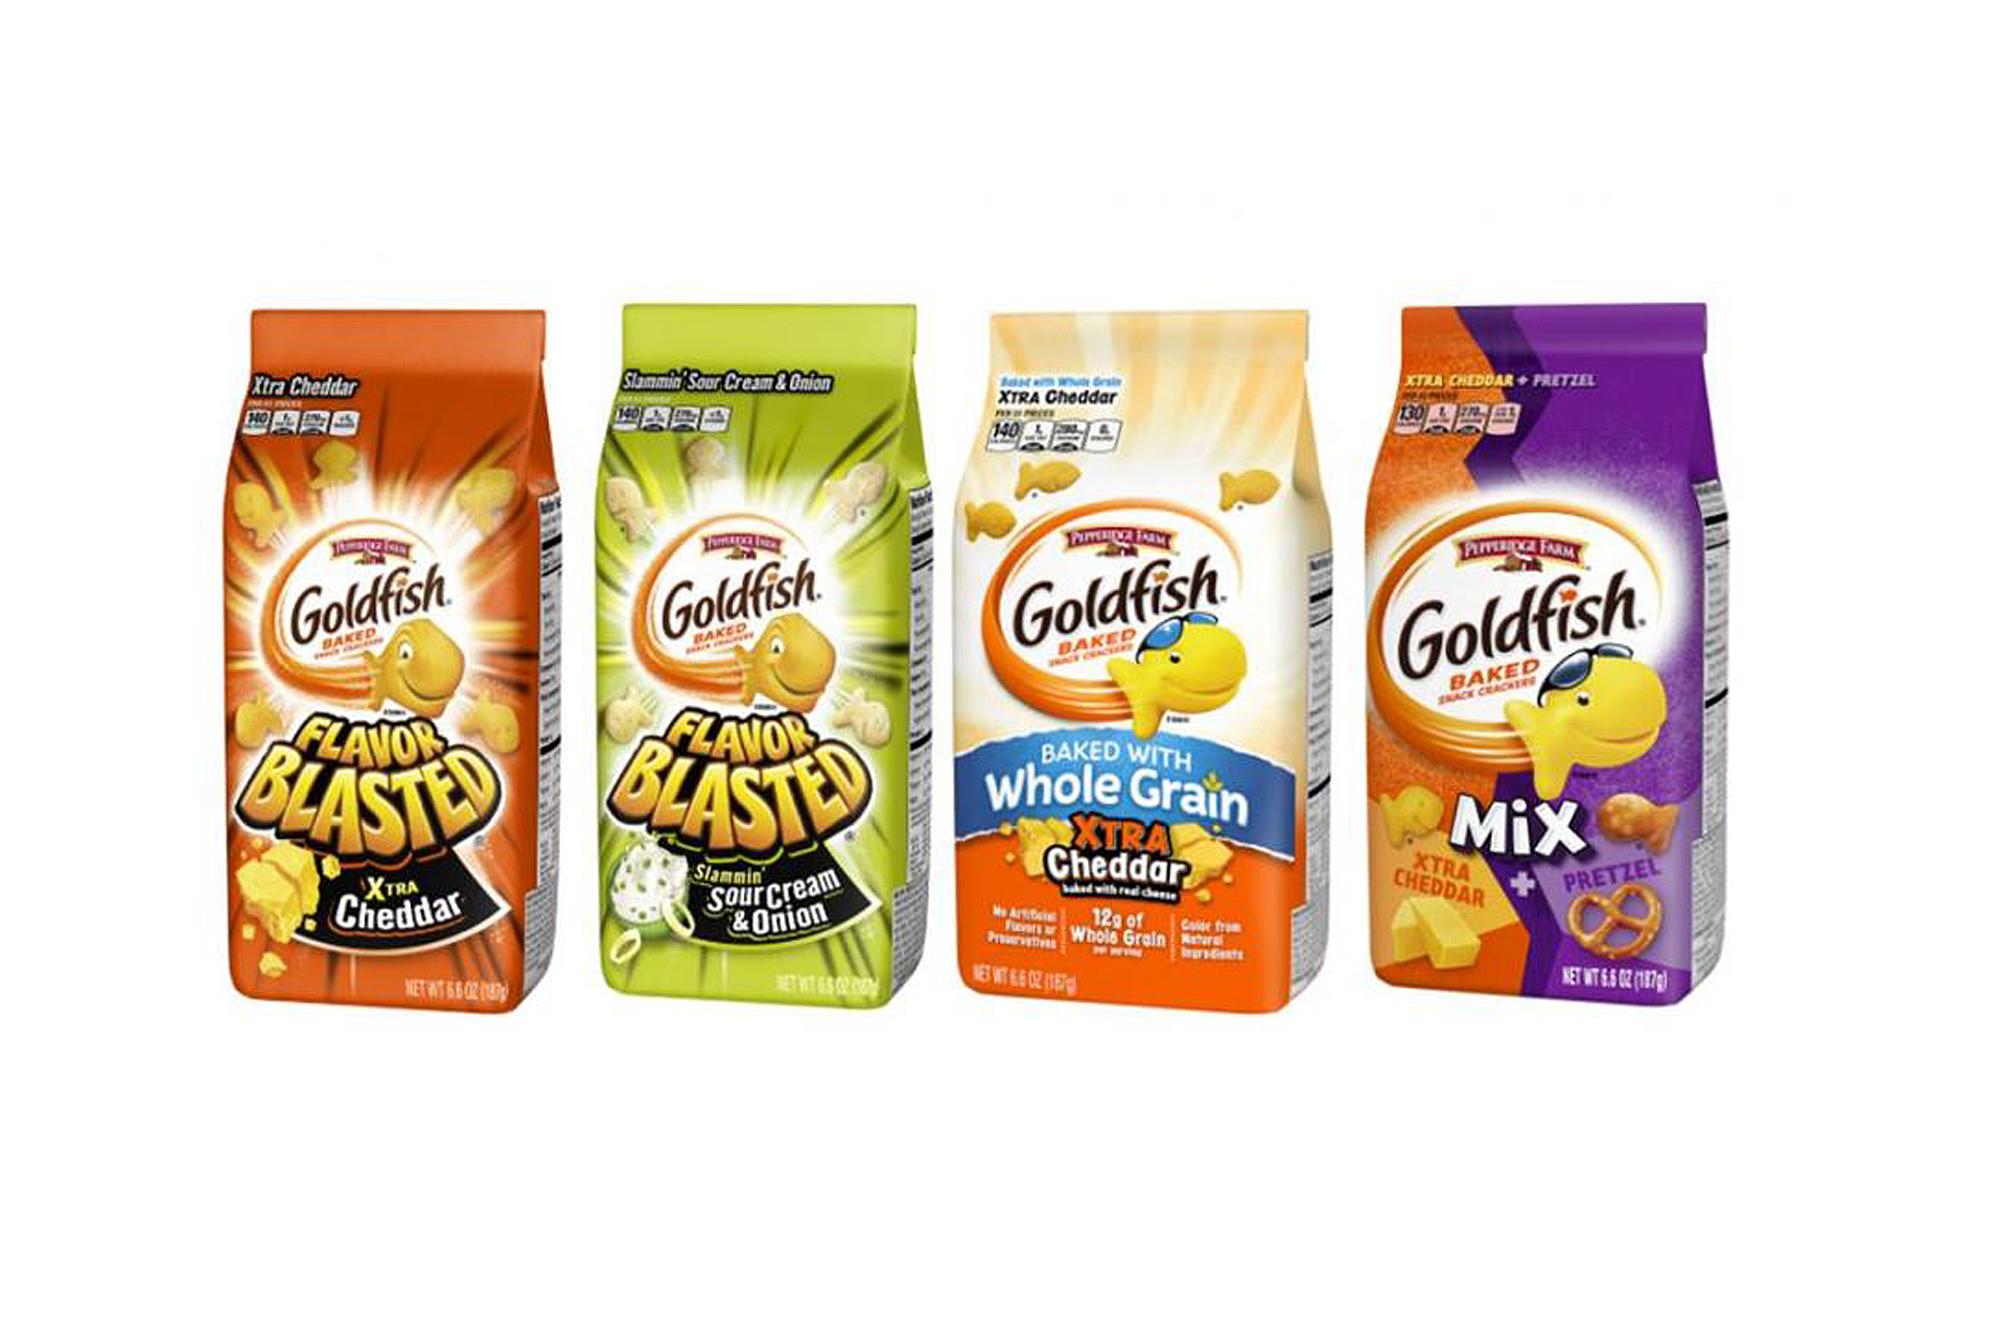 goldfish-recall-flavors-1-2000_1532435302222.jpg